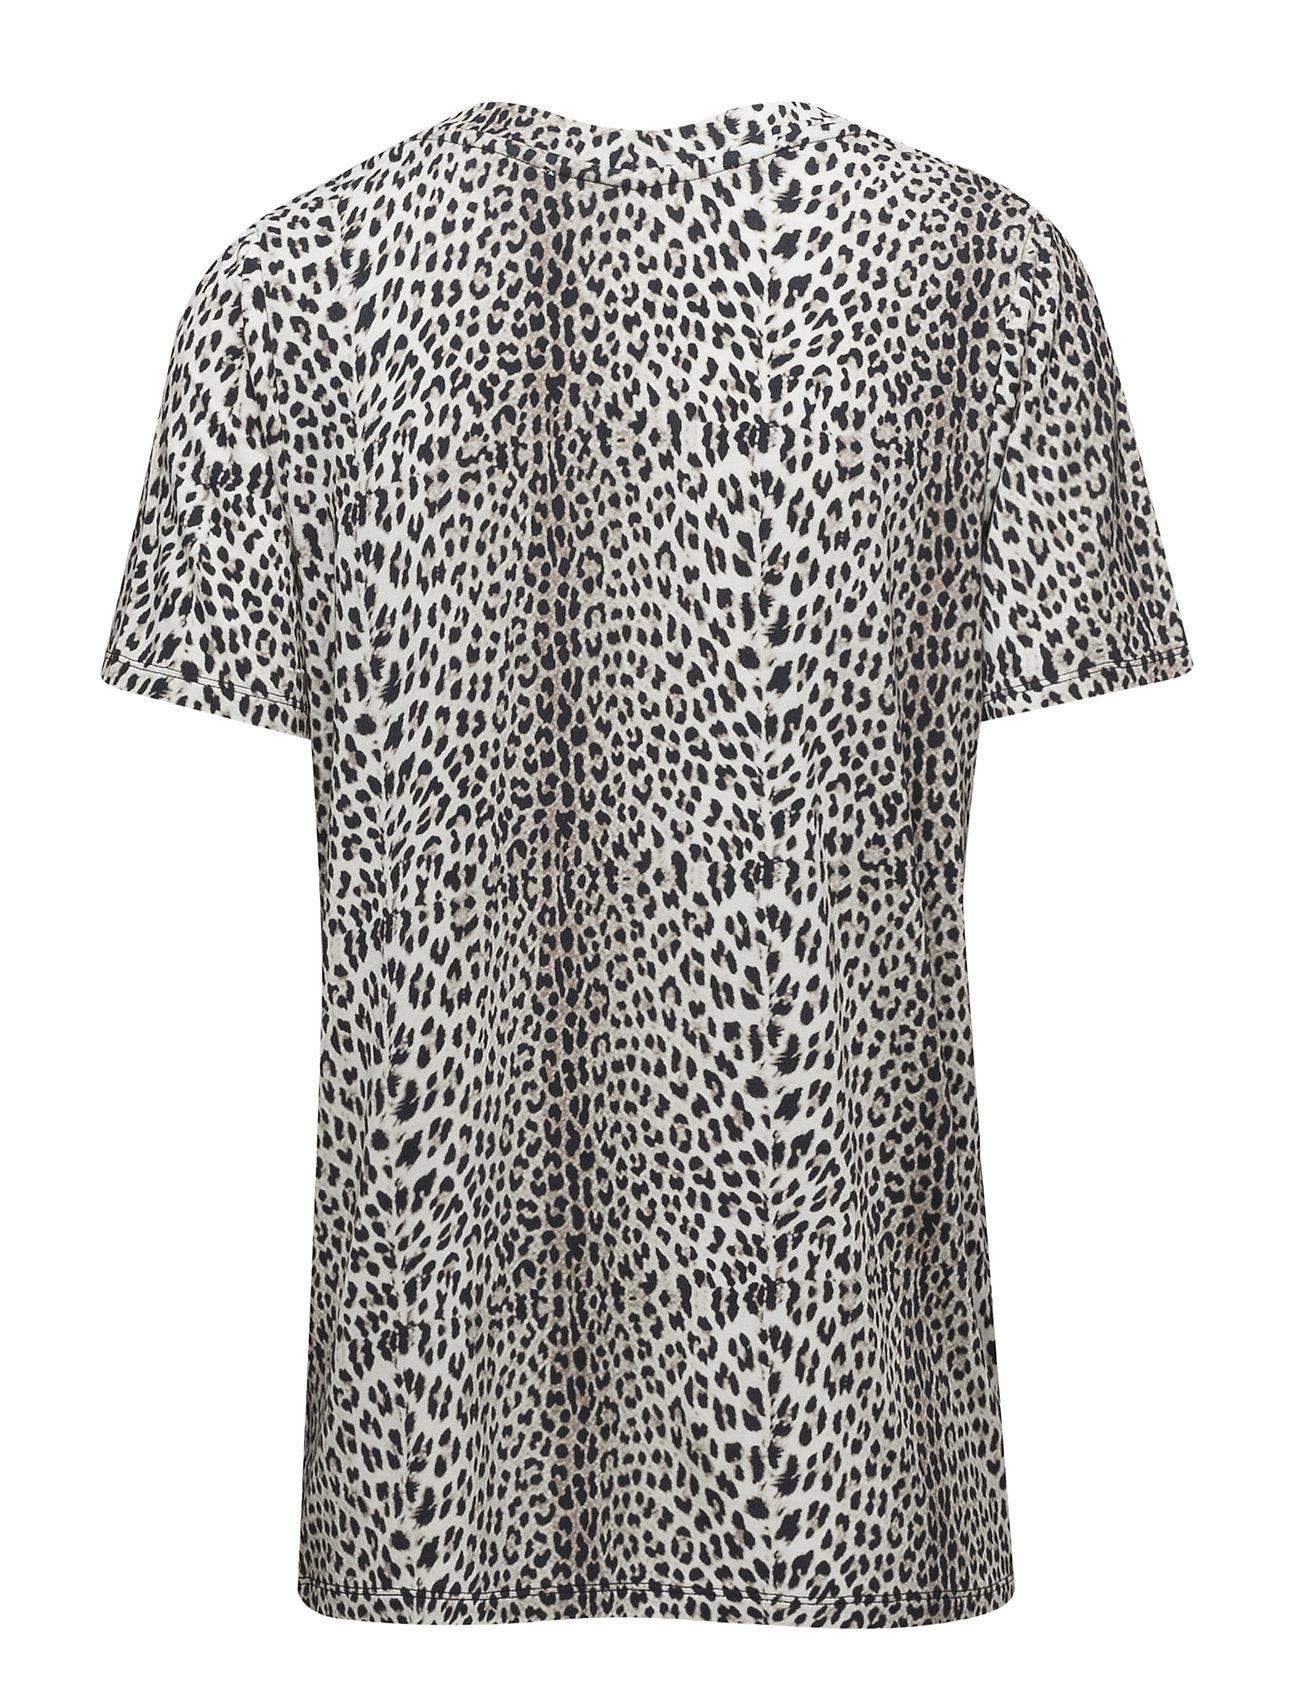 T PrintleopardNotes Dallas shirt Nord Du 1cJFTlK